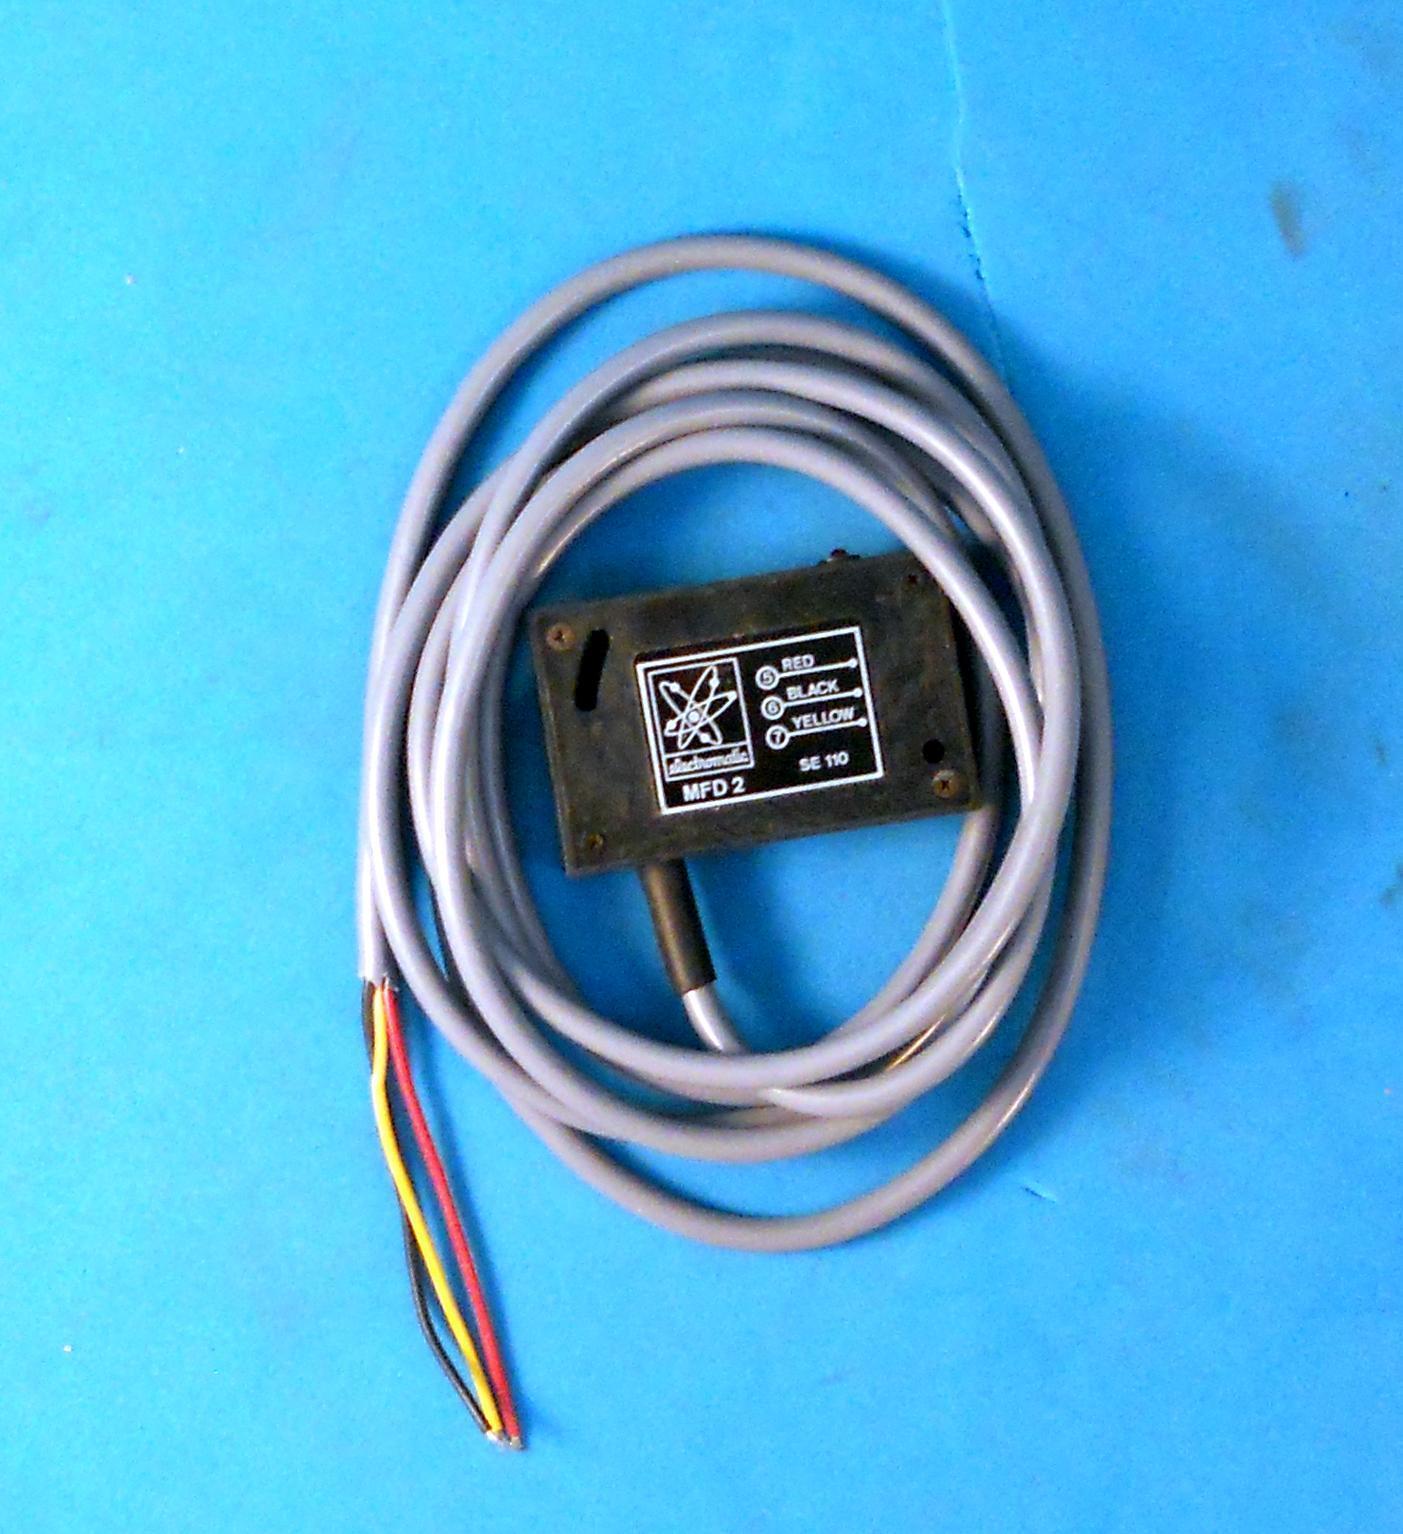 Electromatic Mfd-2 Photoelectric Sensor 65589   eBay